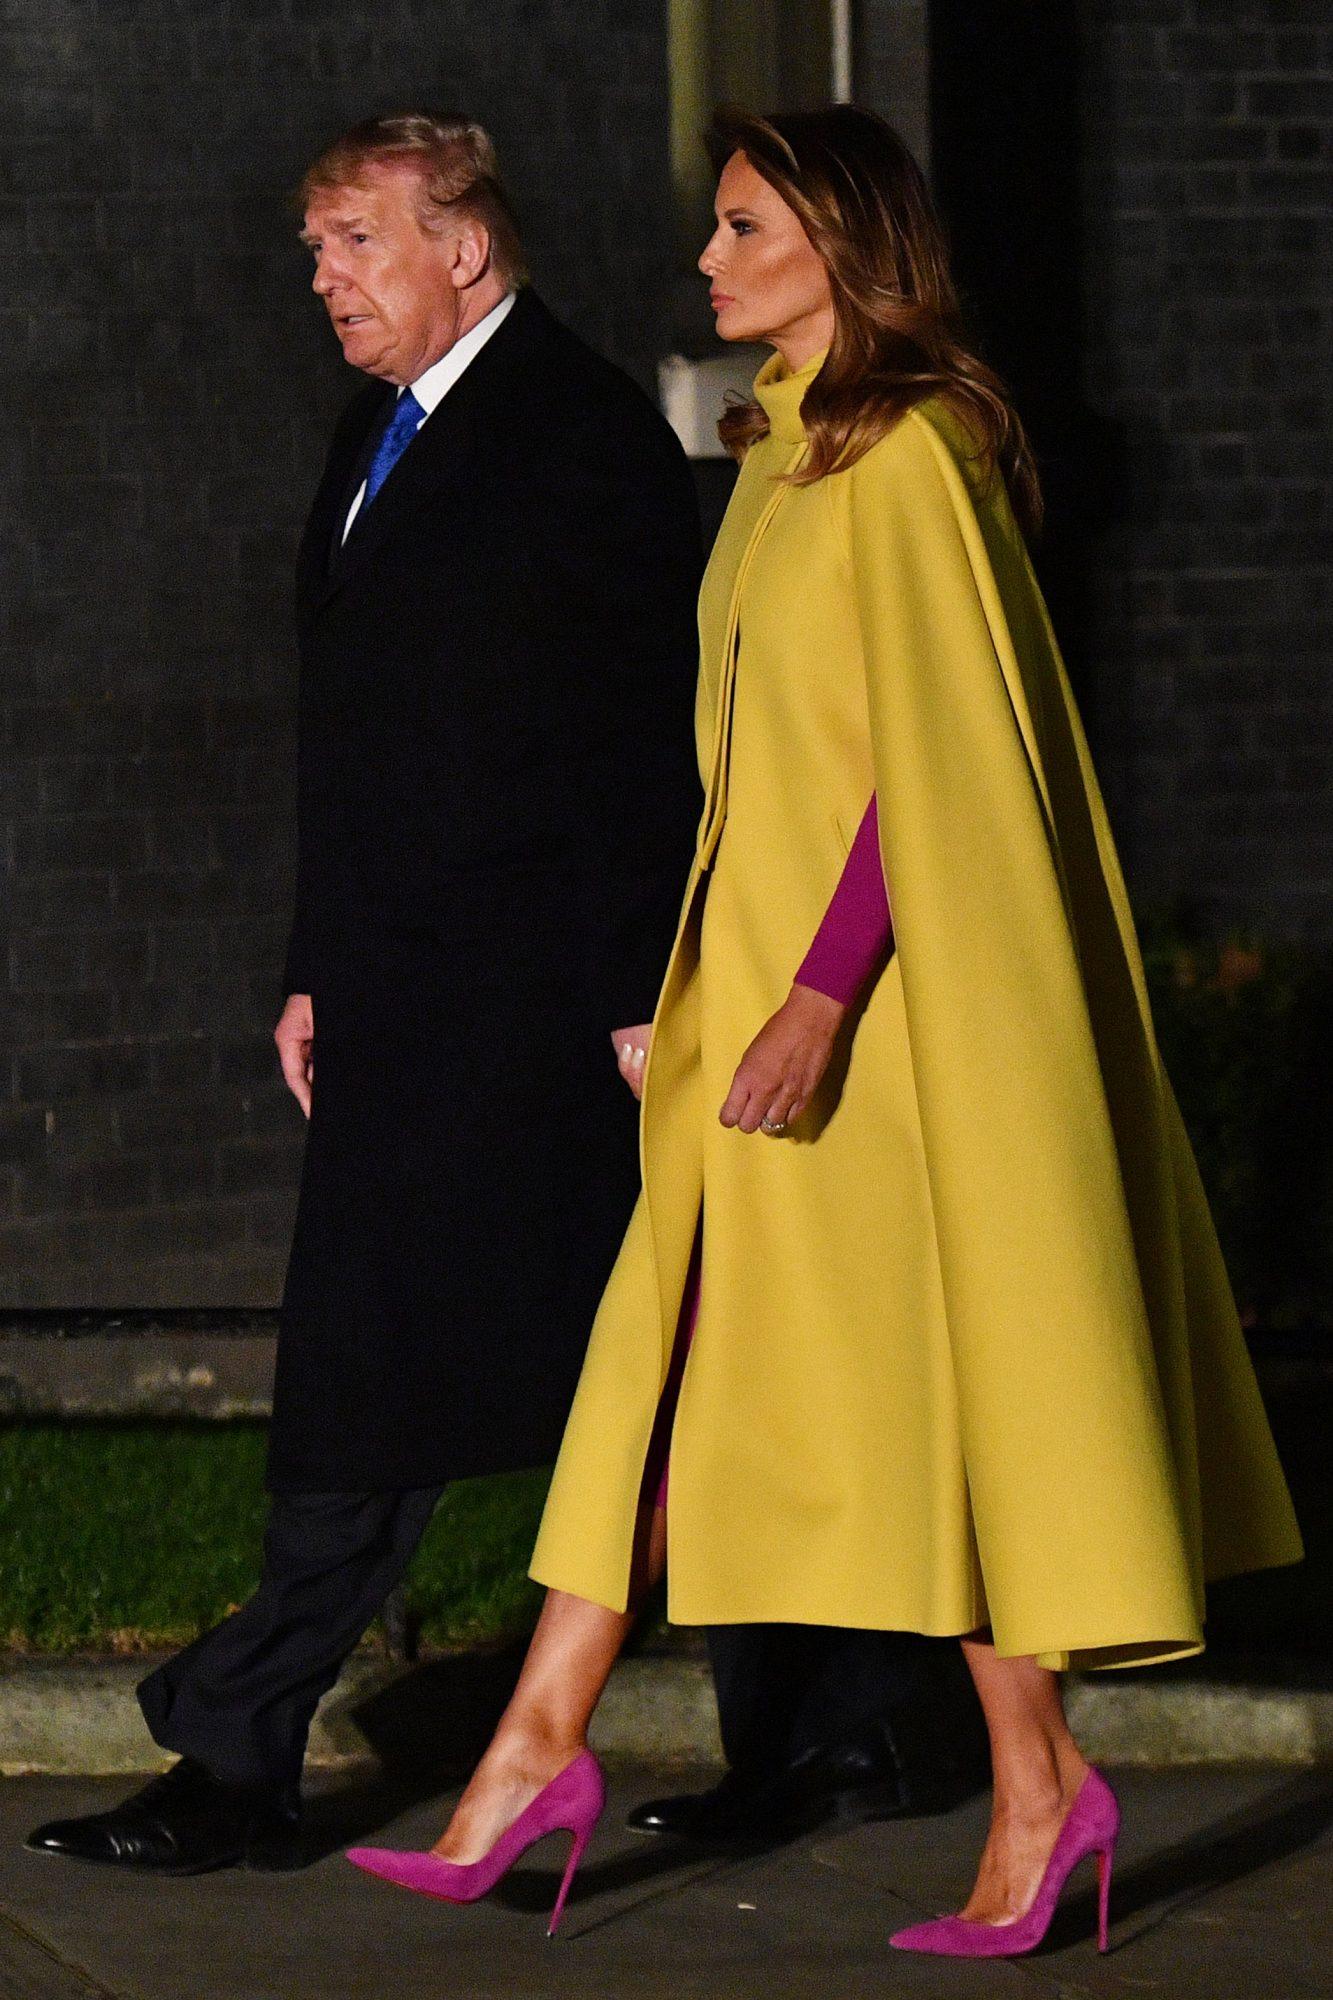 Mejores looks de Melania Trump, Melania Trump, looks, melania trump en la casa blanca